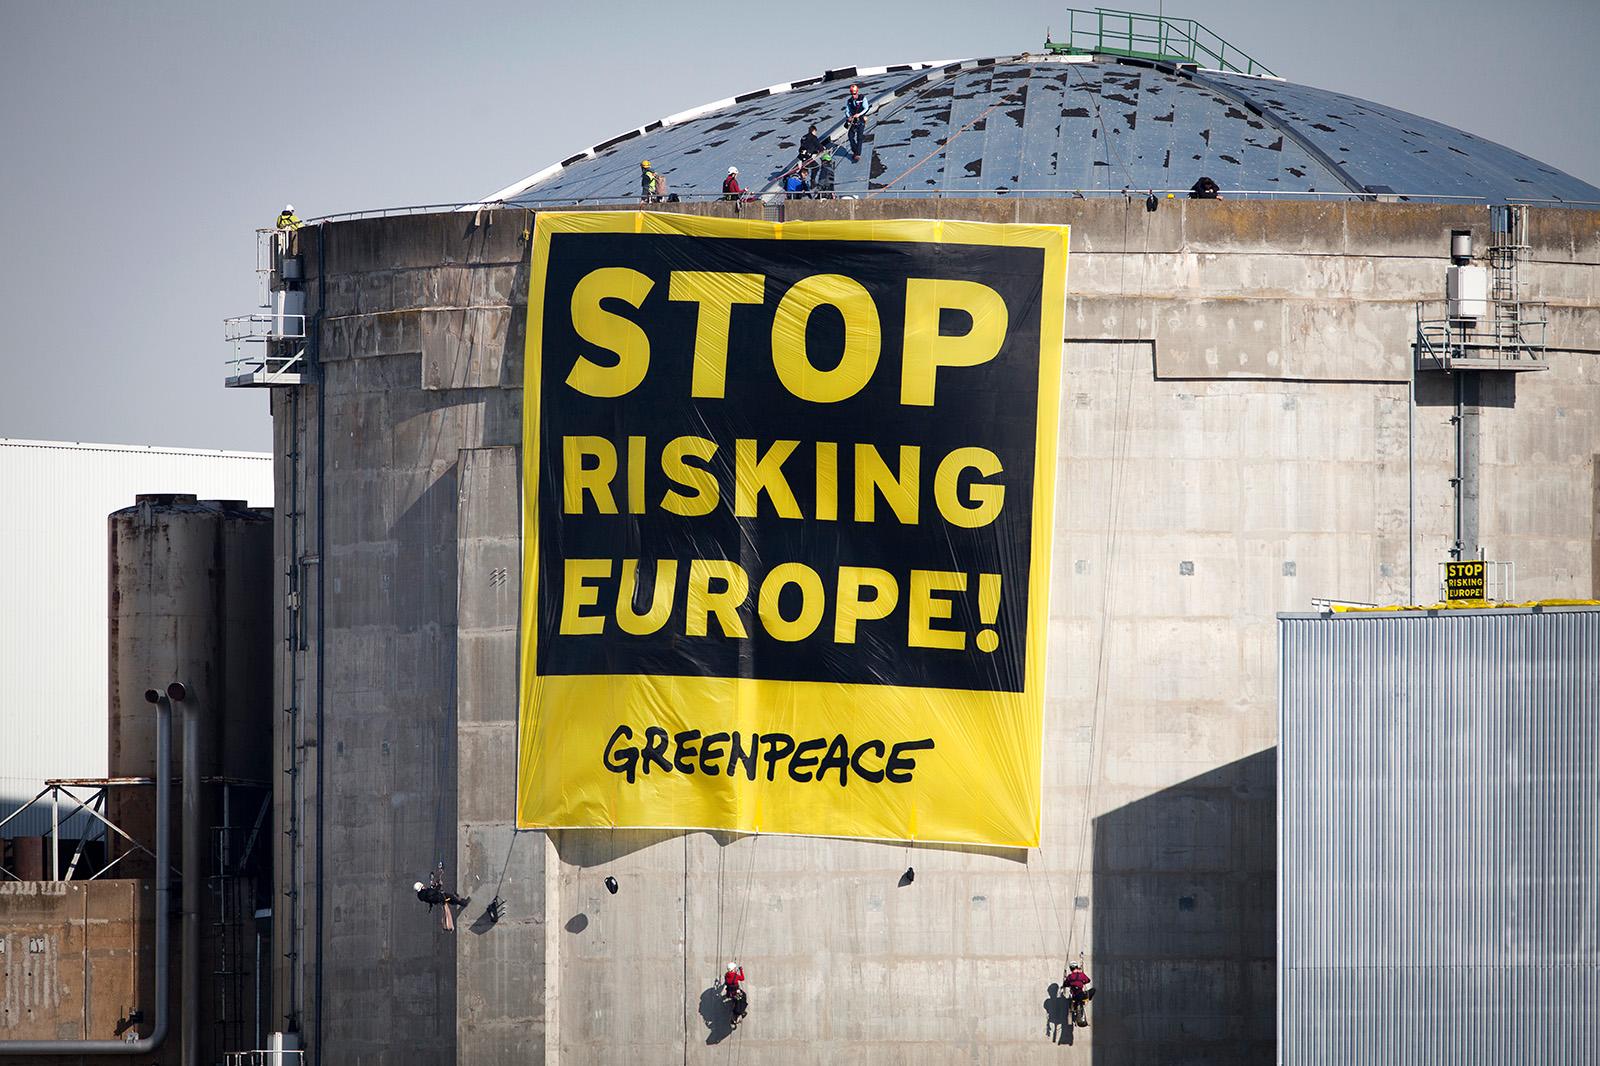 Greenpeace-Aktivist*innen protestieren gegen den Weiterbetrieb alter Atomkraftwerke in Europa. 2014